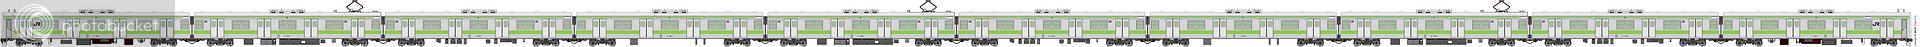 Train 2001